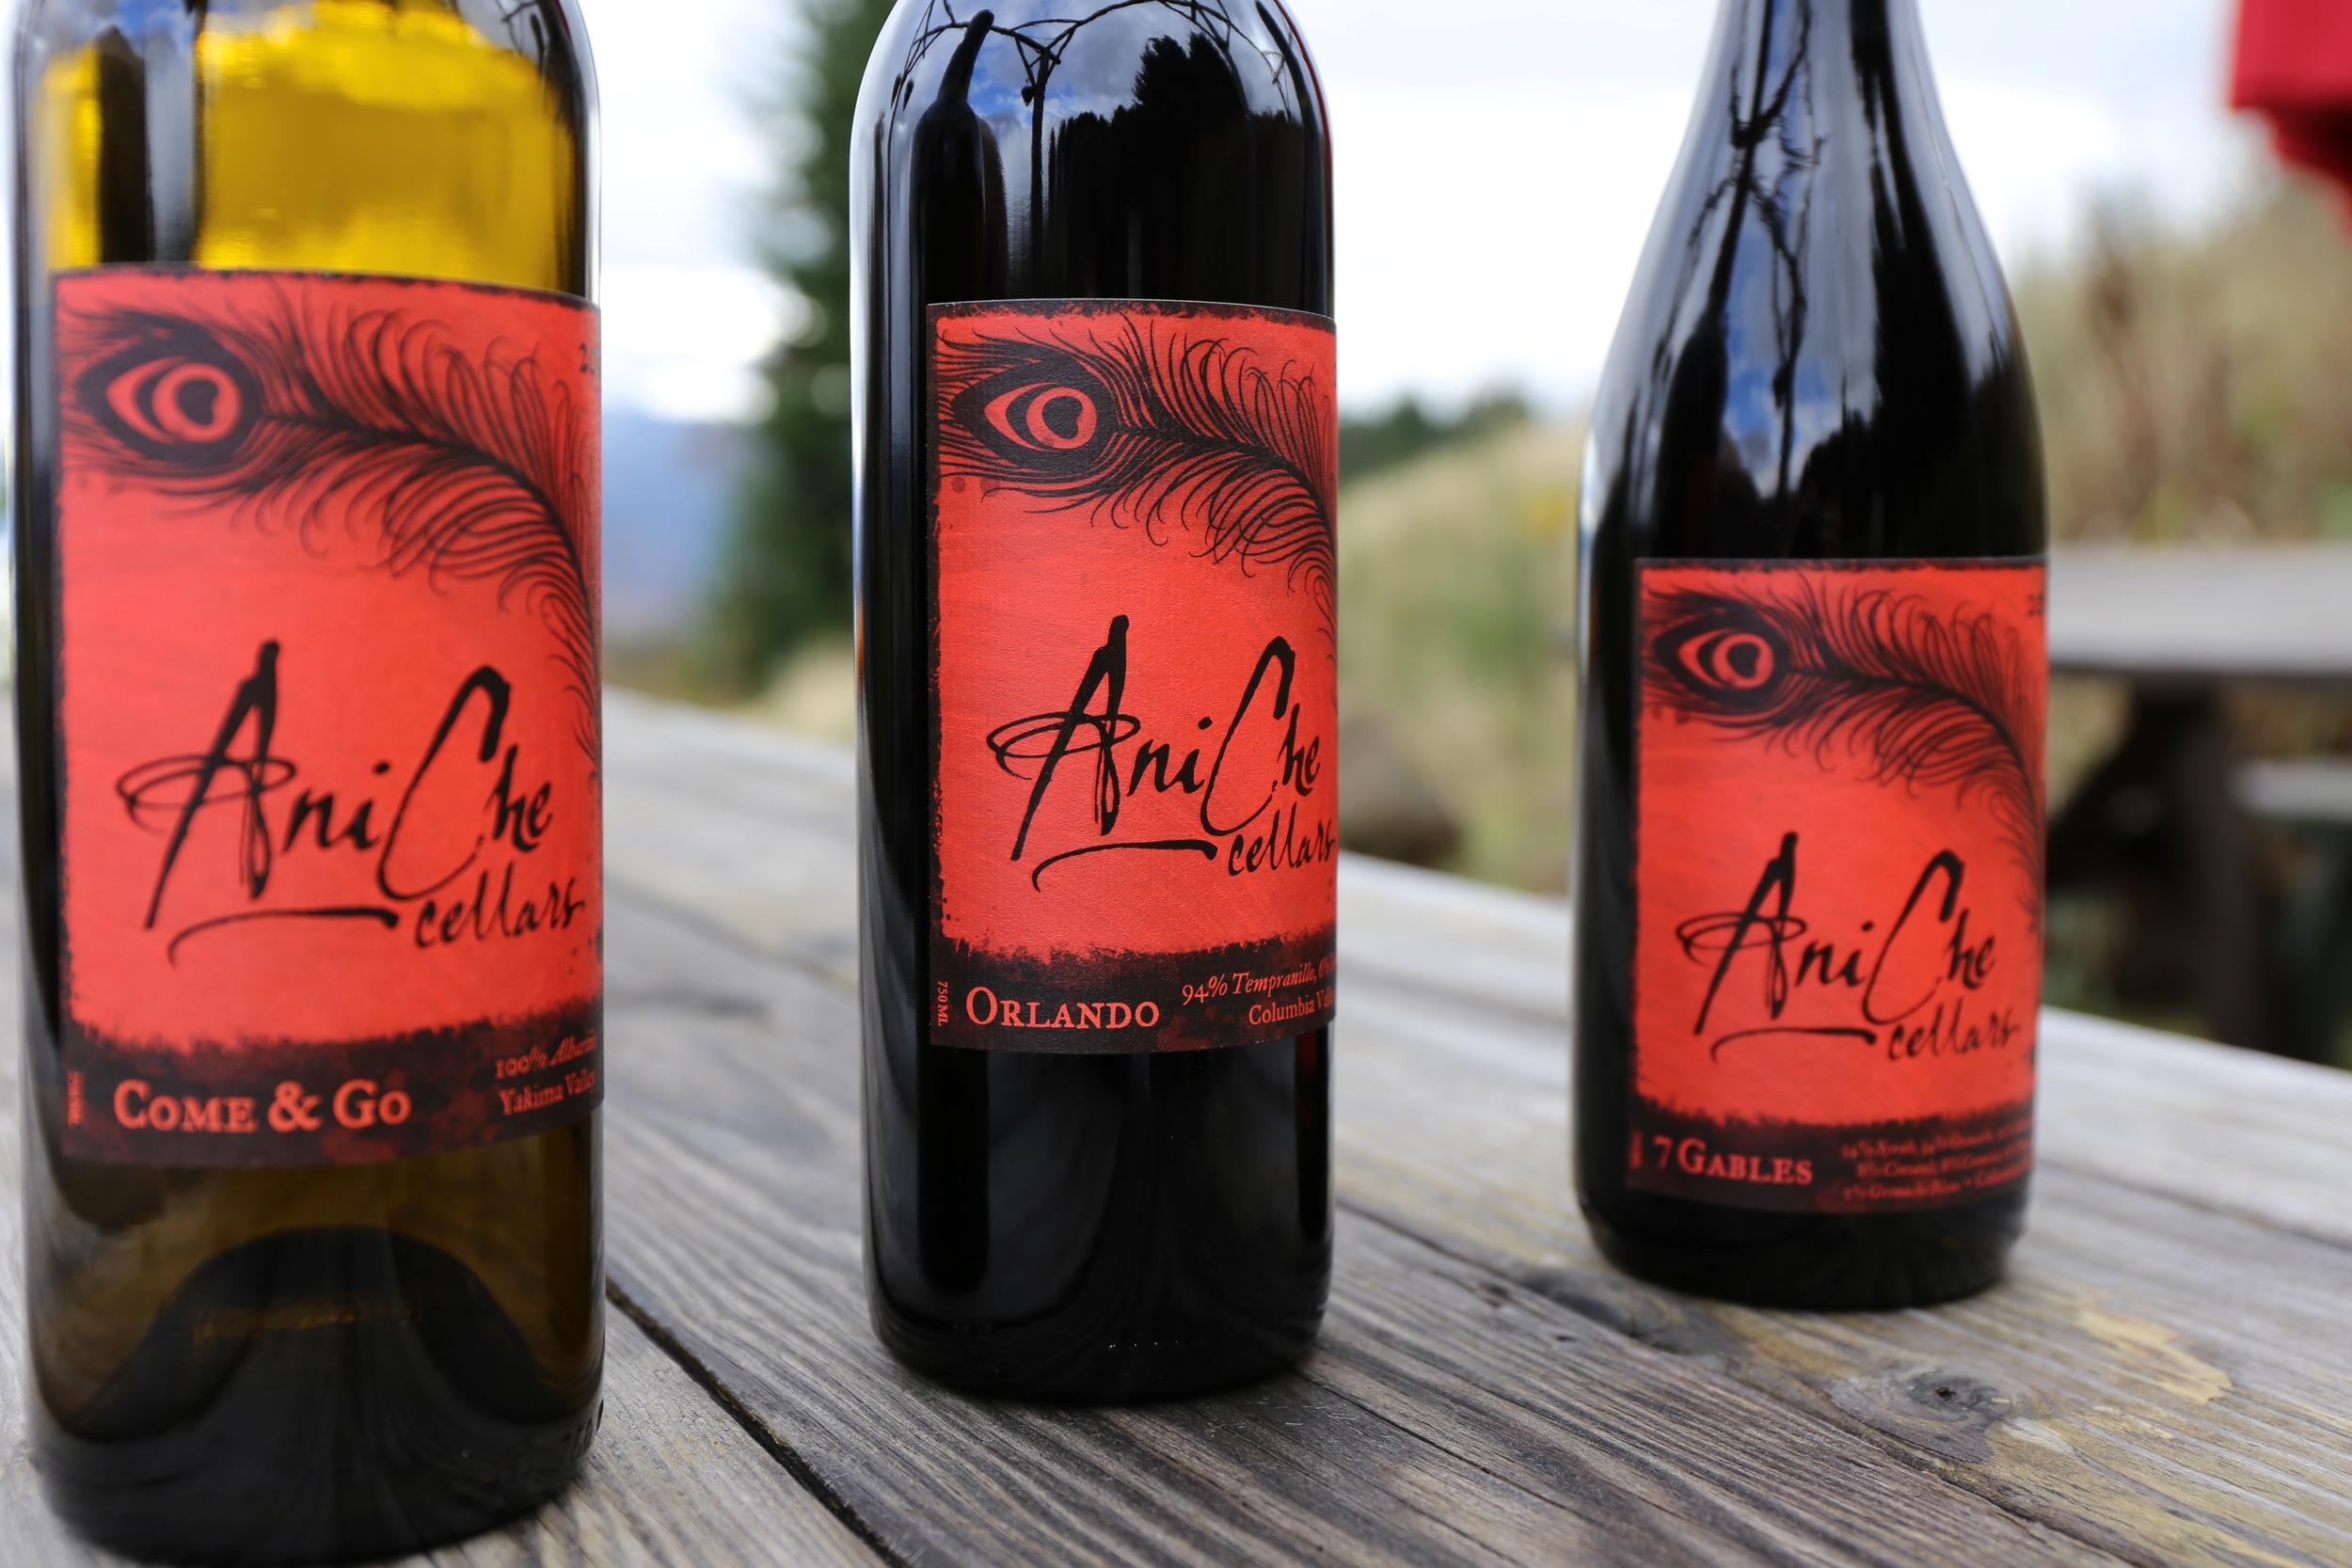 AniChe Cellars wines